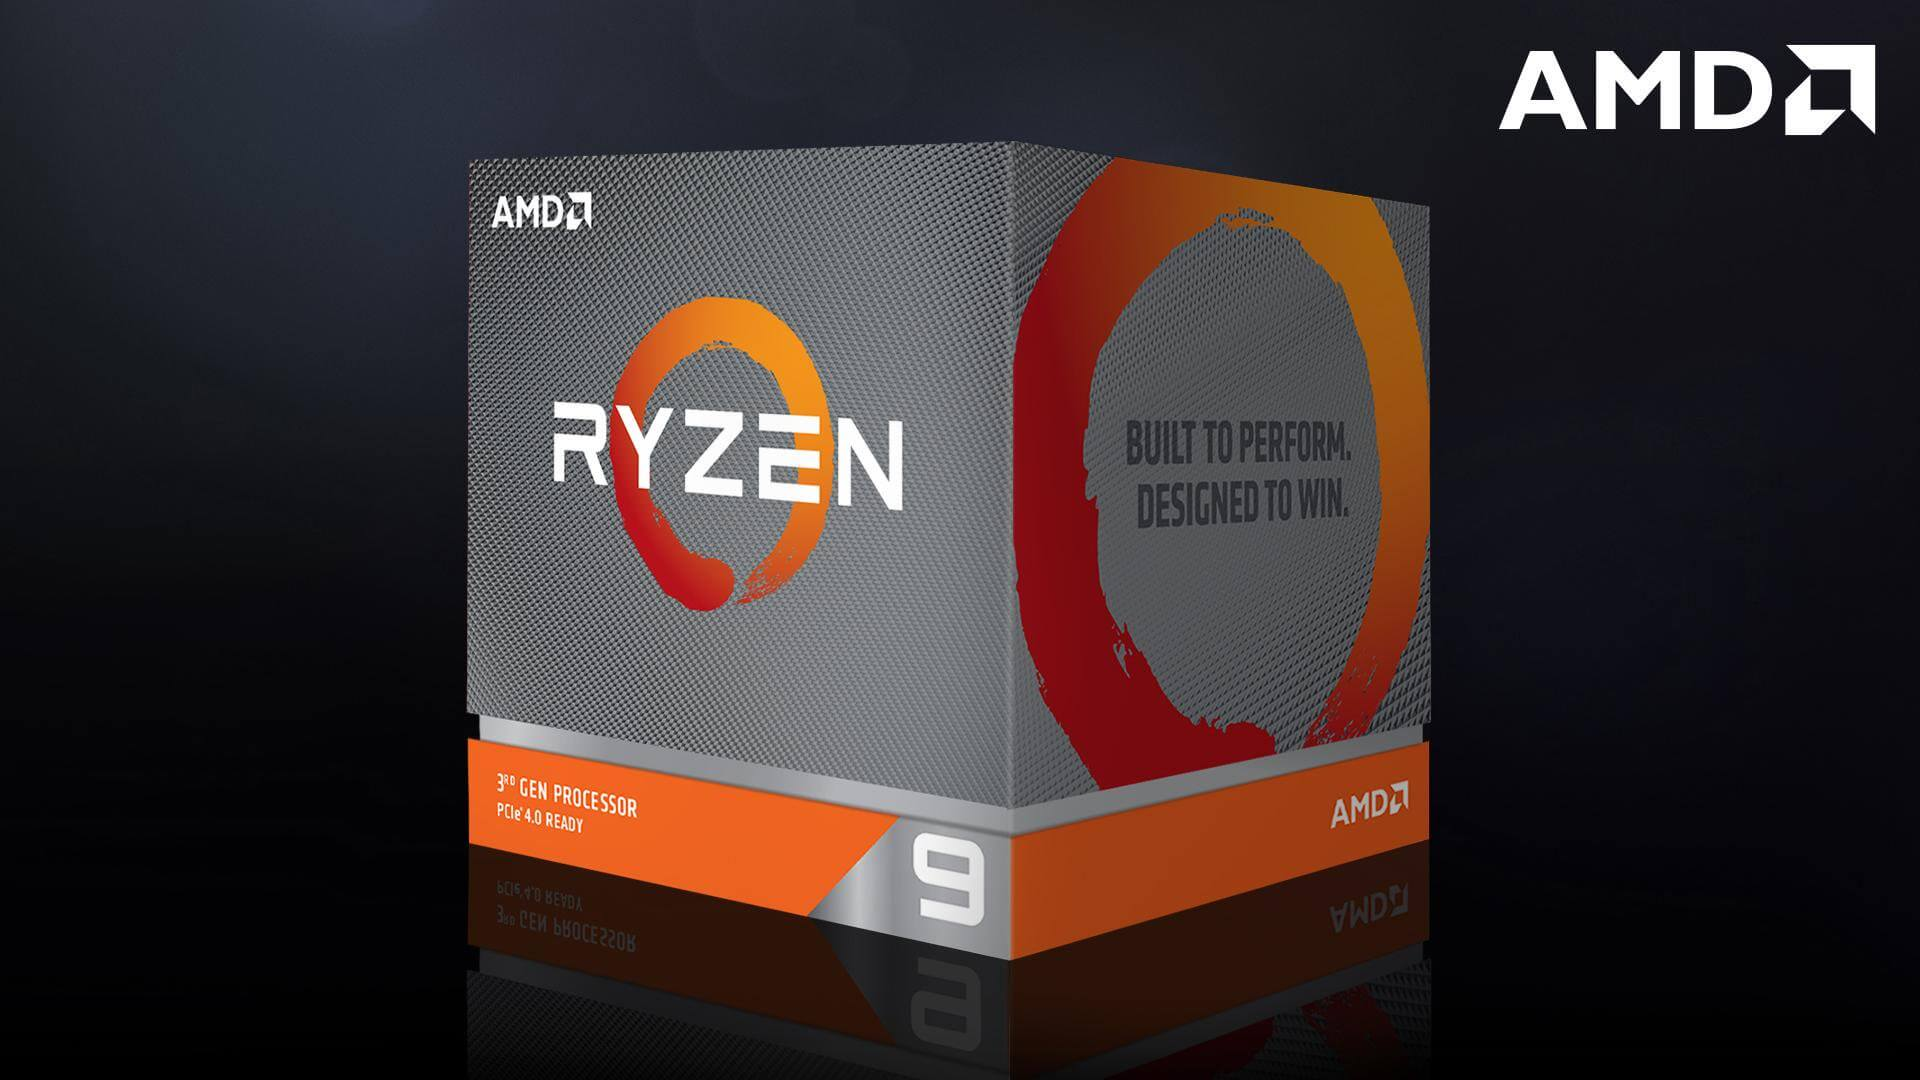 Ryzen 9 3950x Workstation Solver Build (128 GB RAM)